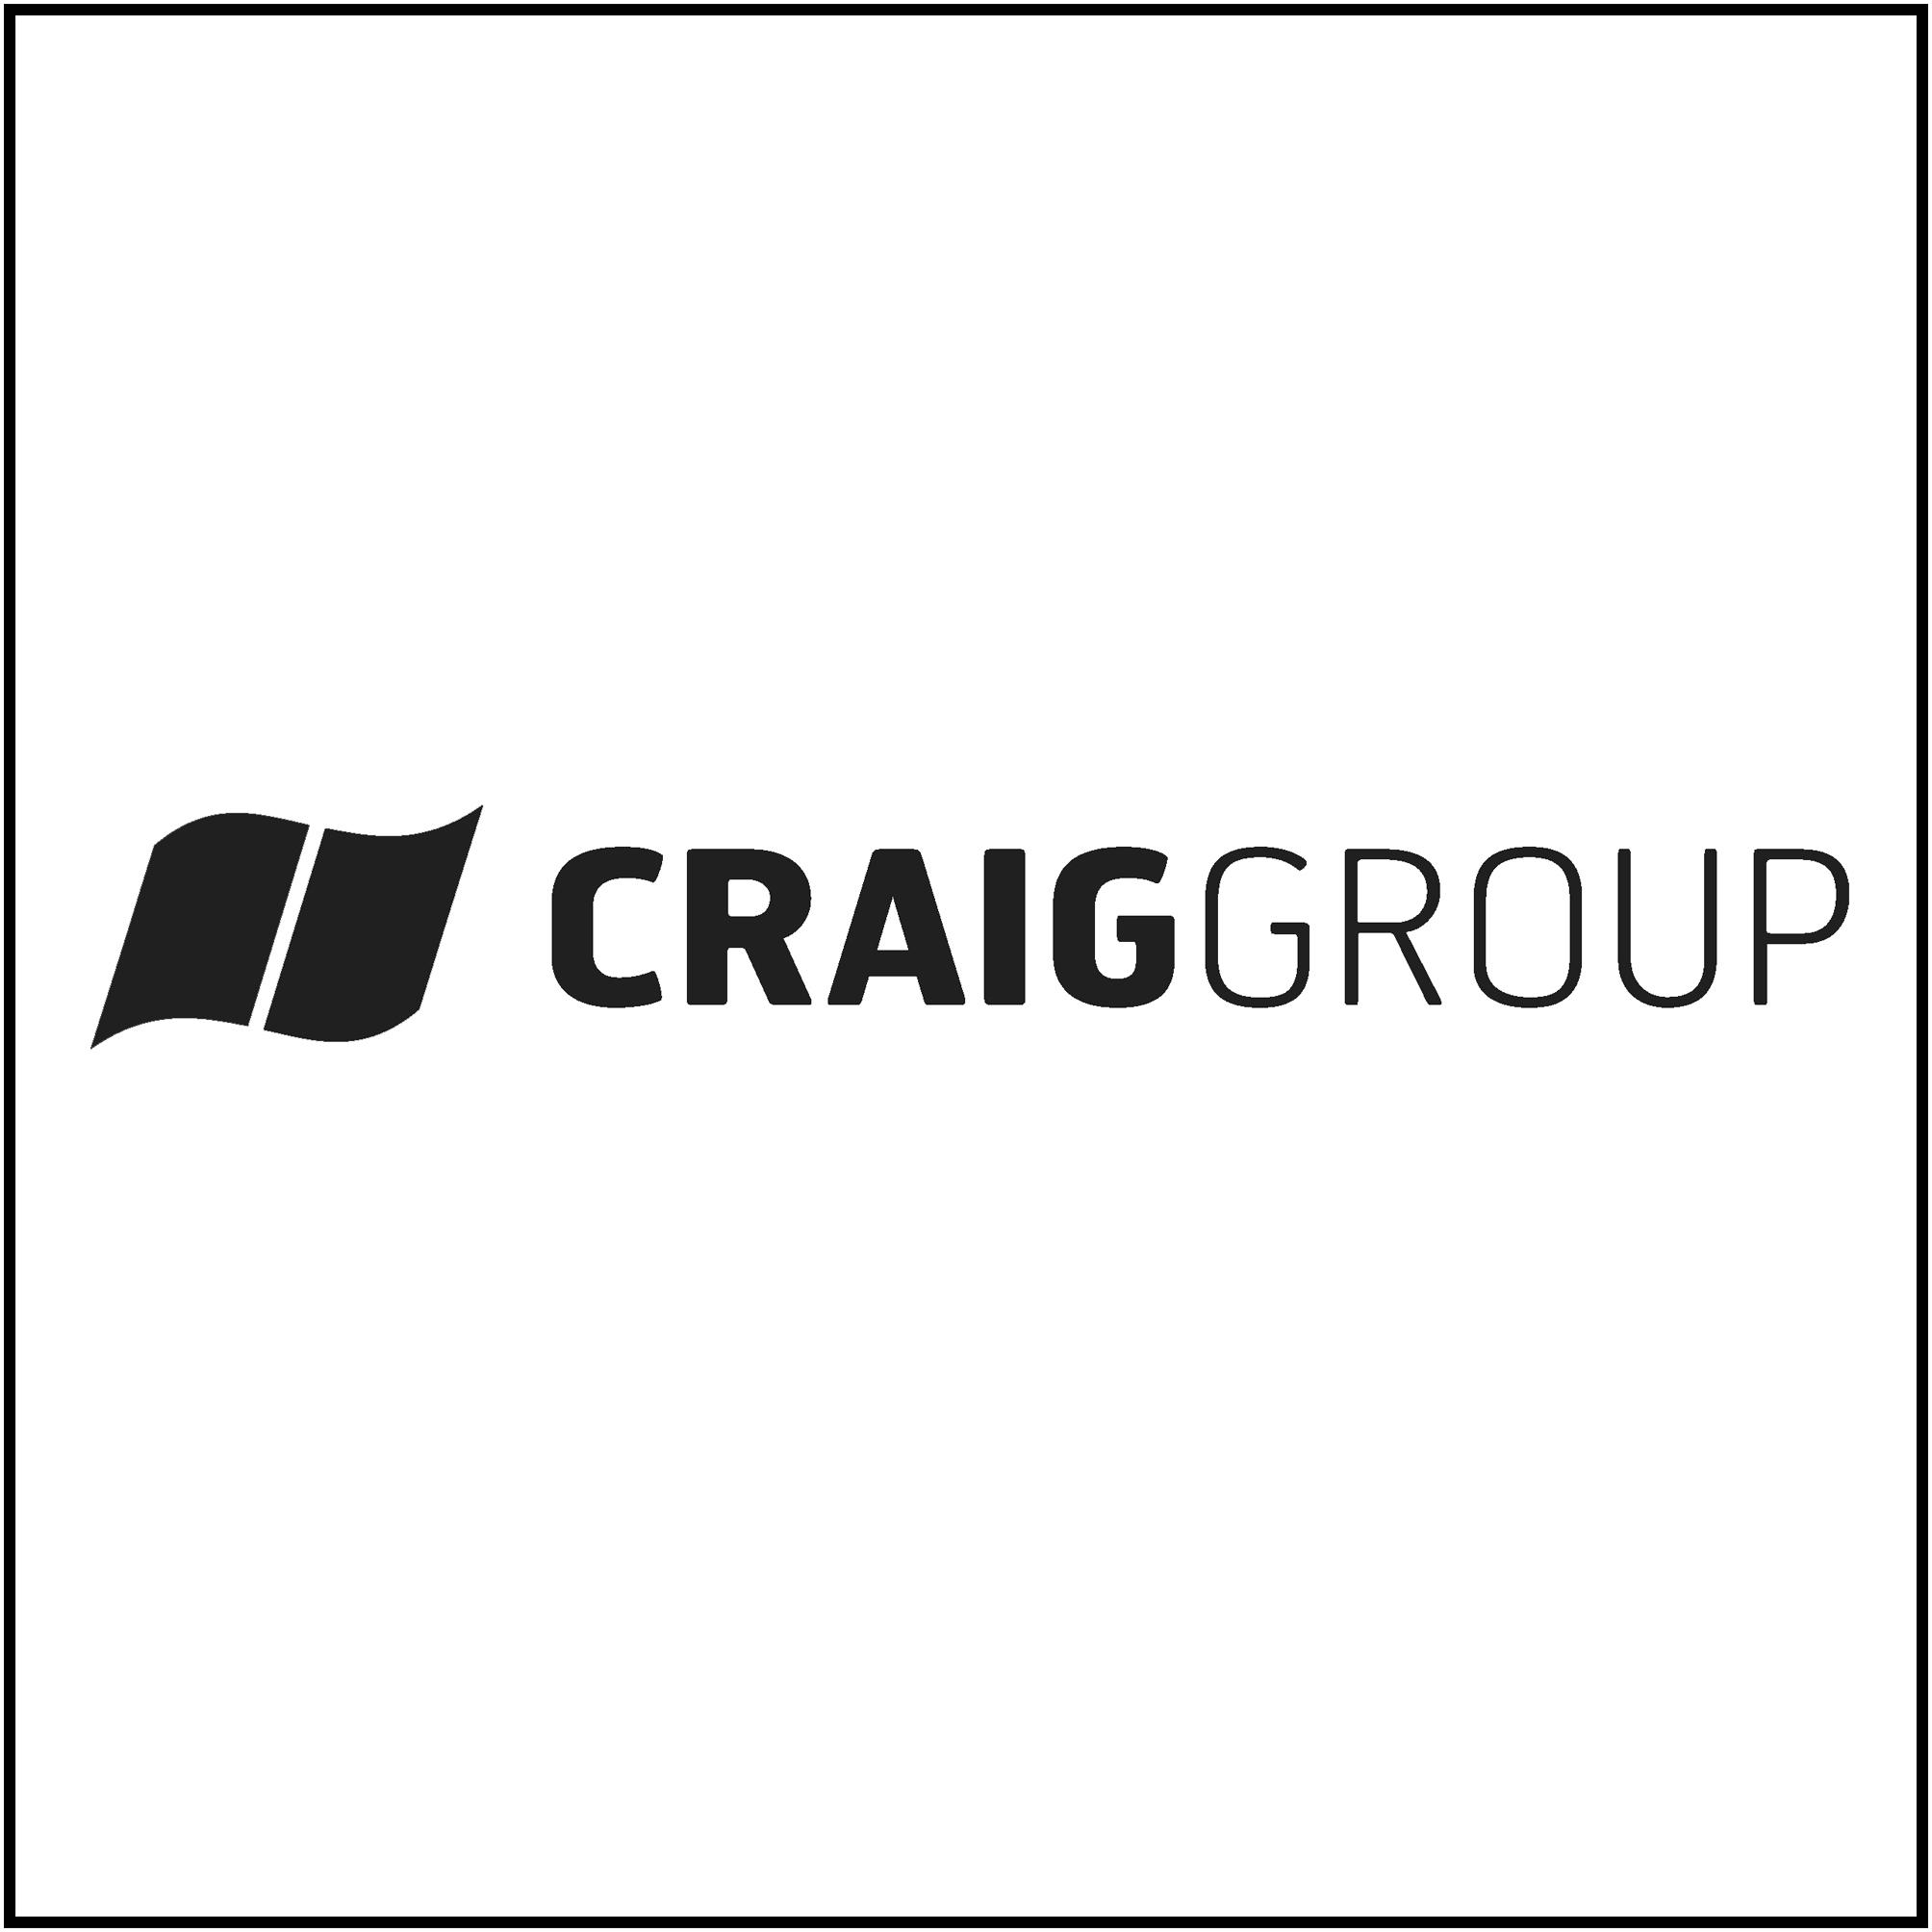 Craig Group logo